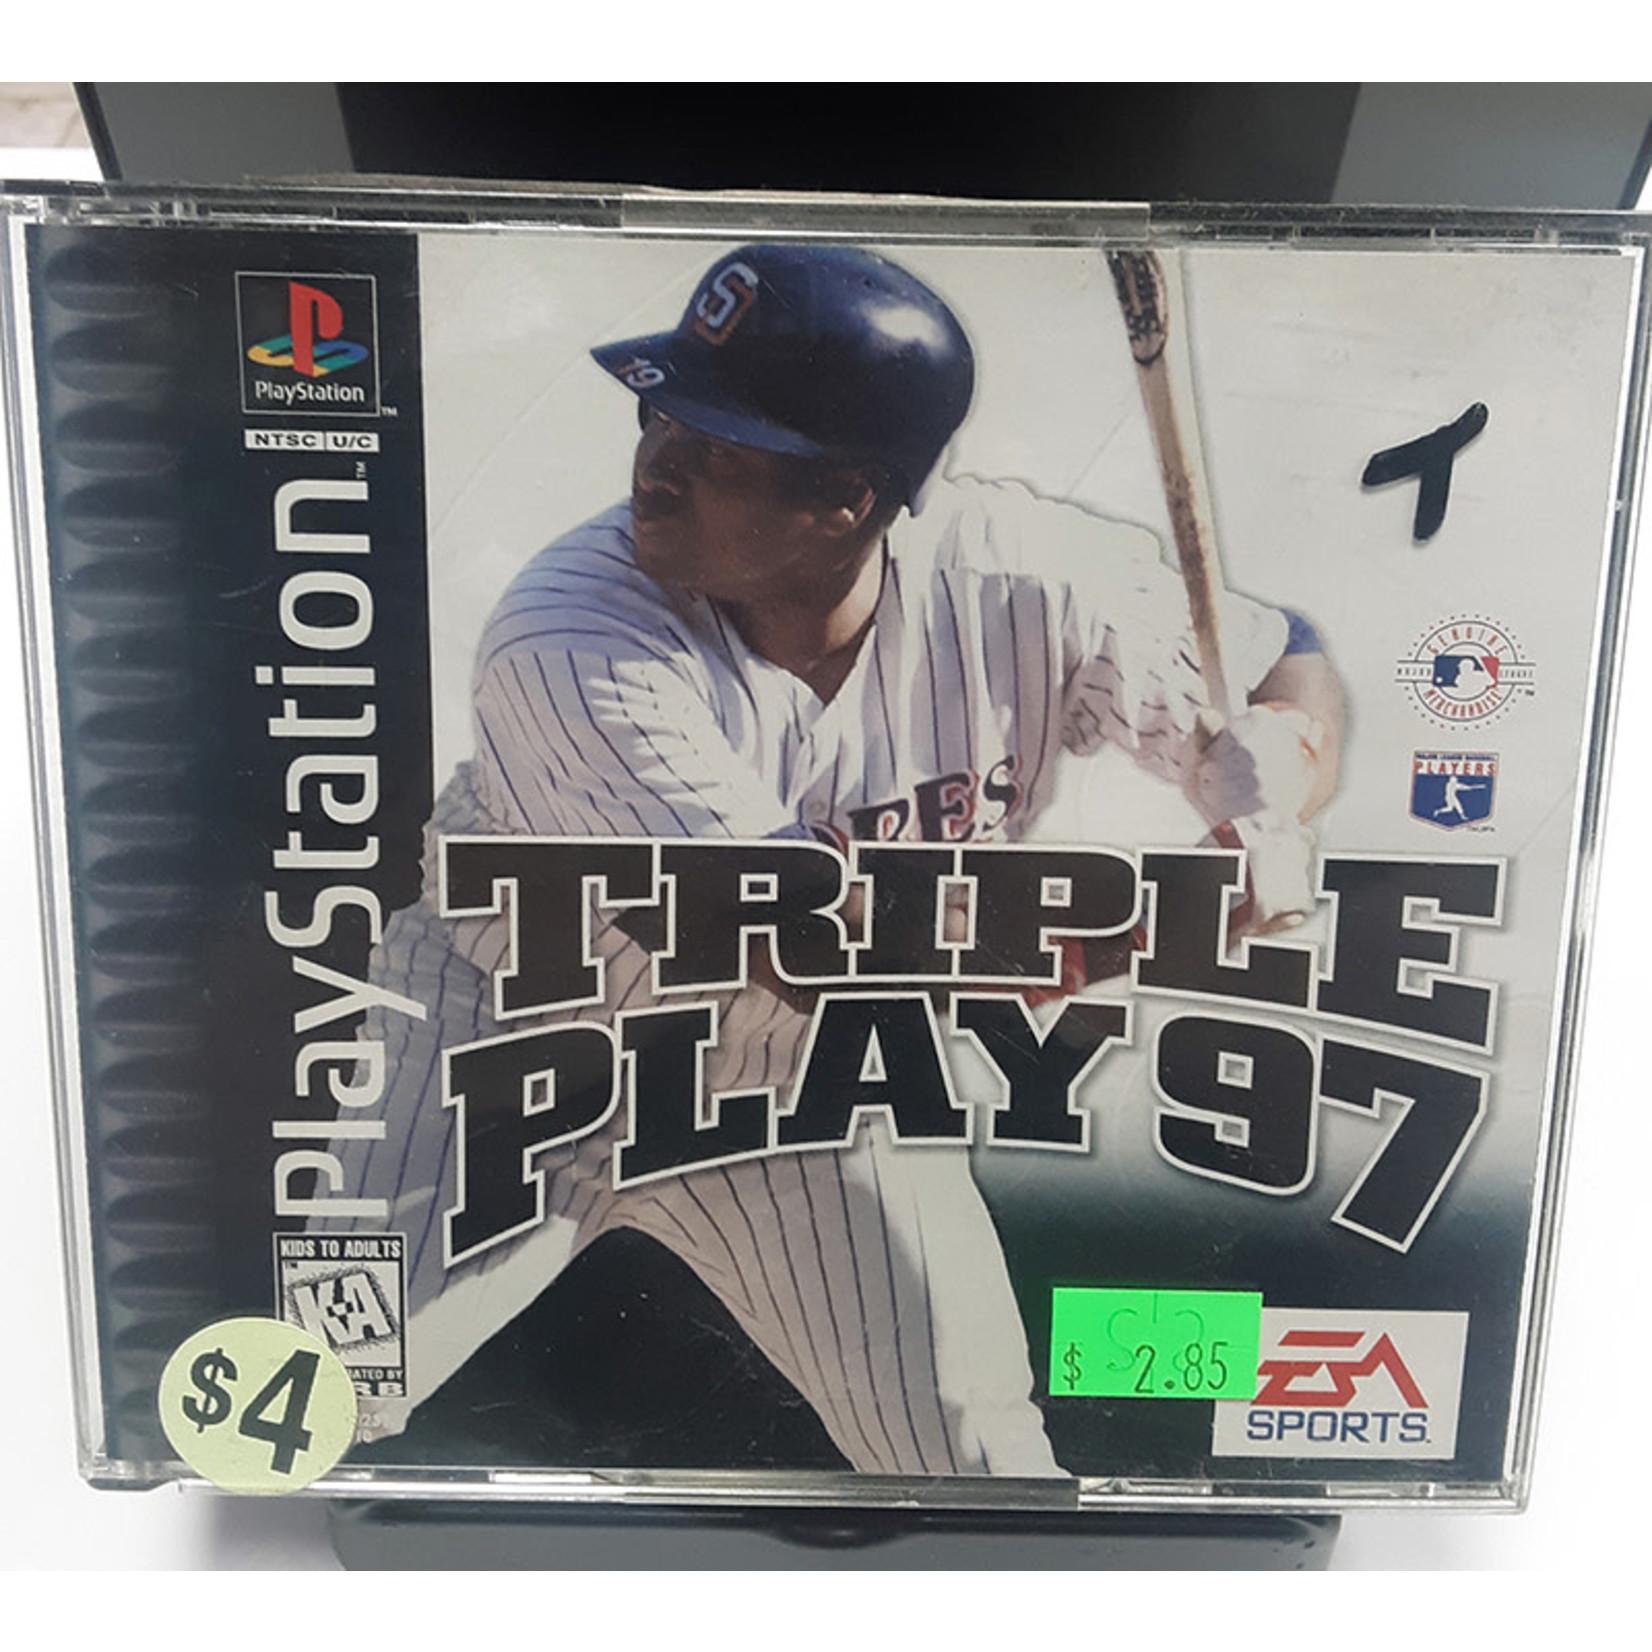 ps1u-Triple Play 97